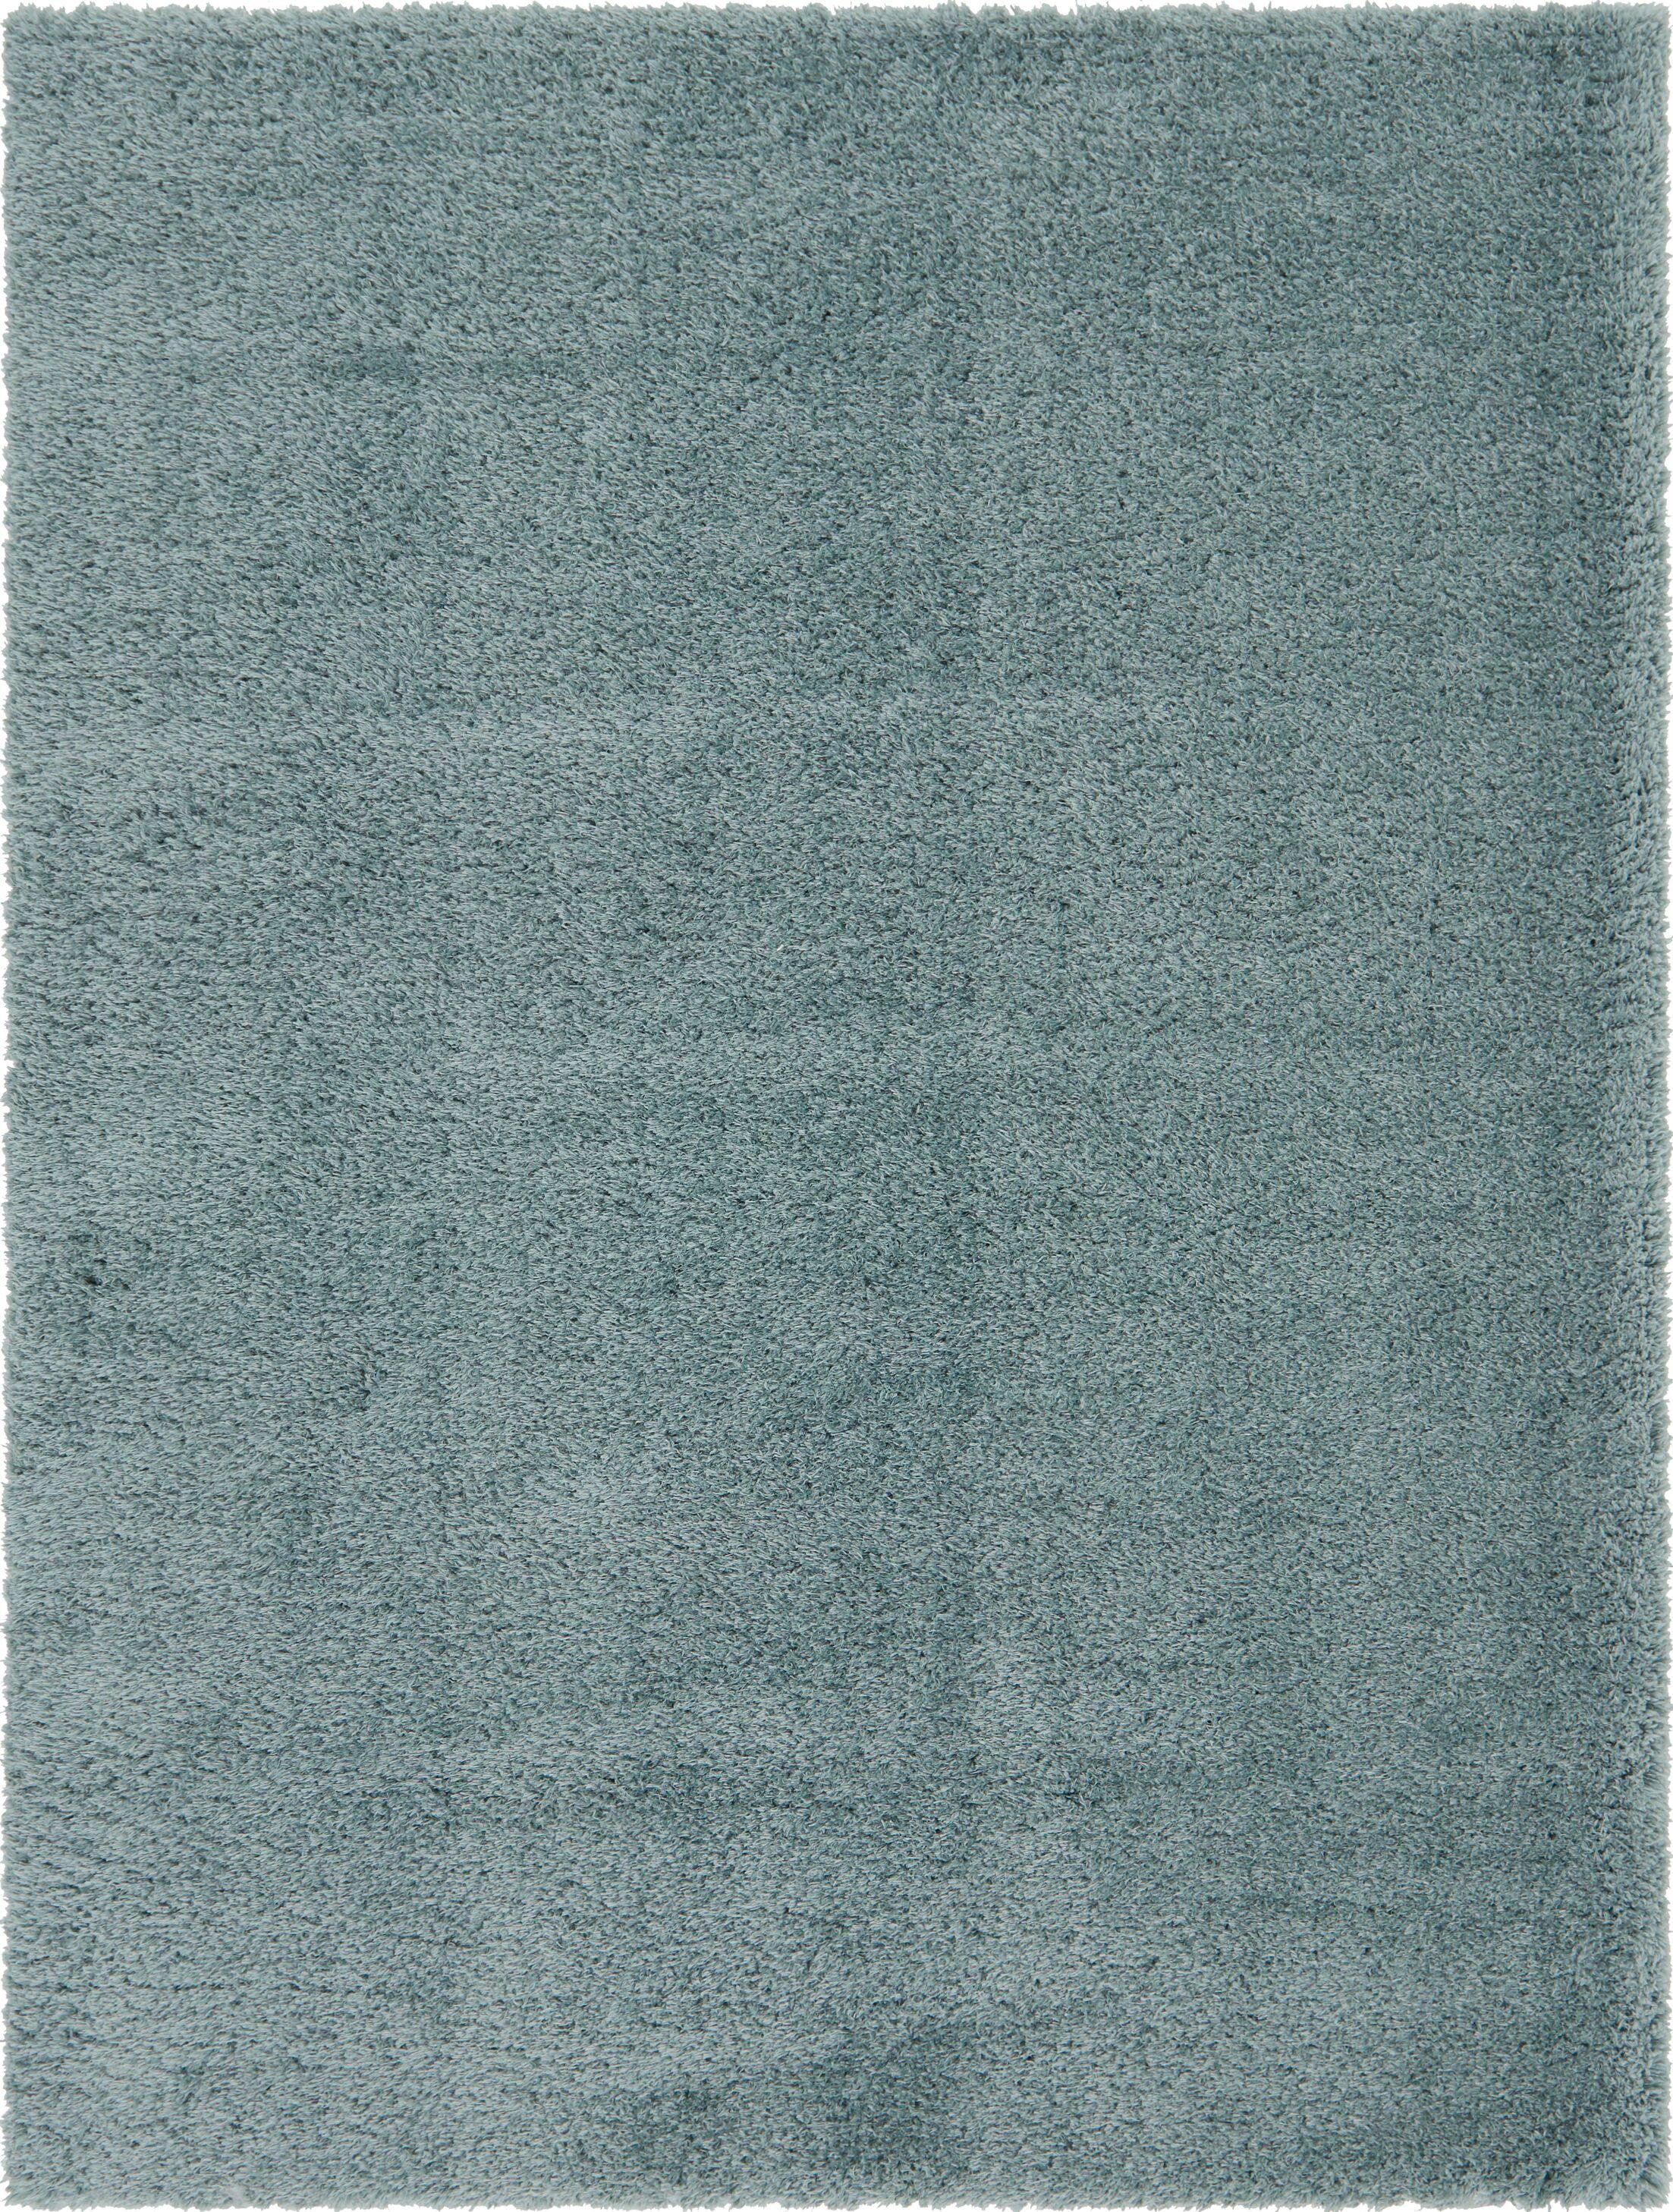 Blue Area Rug Rug Size: 9' x 12'